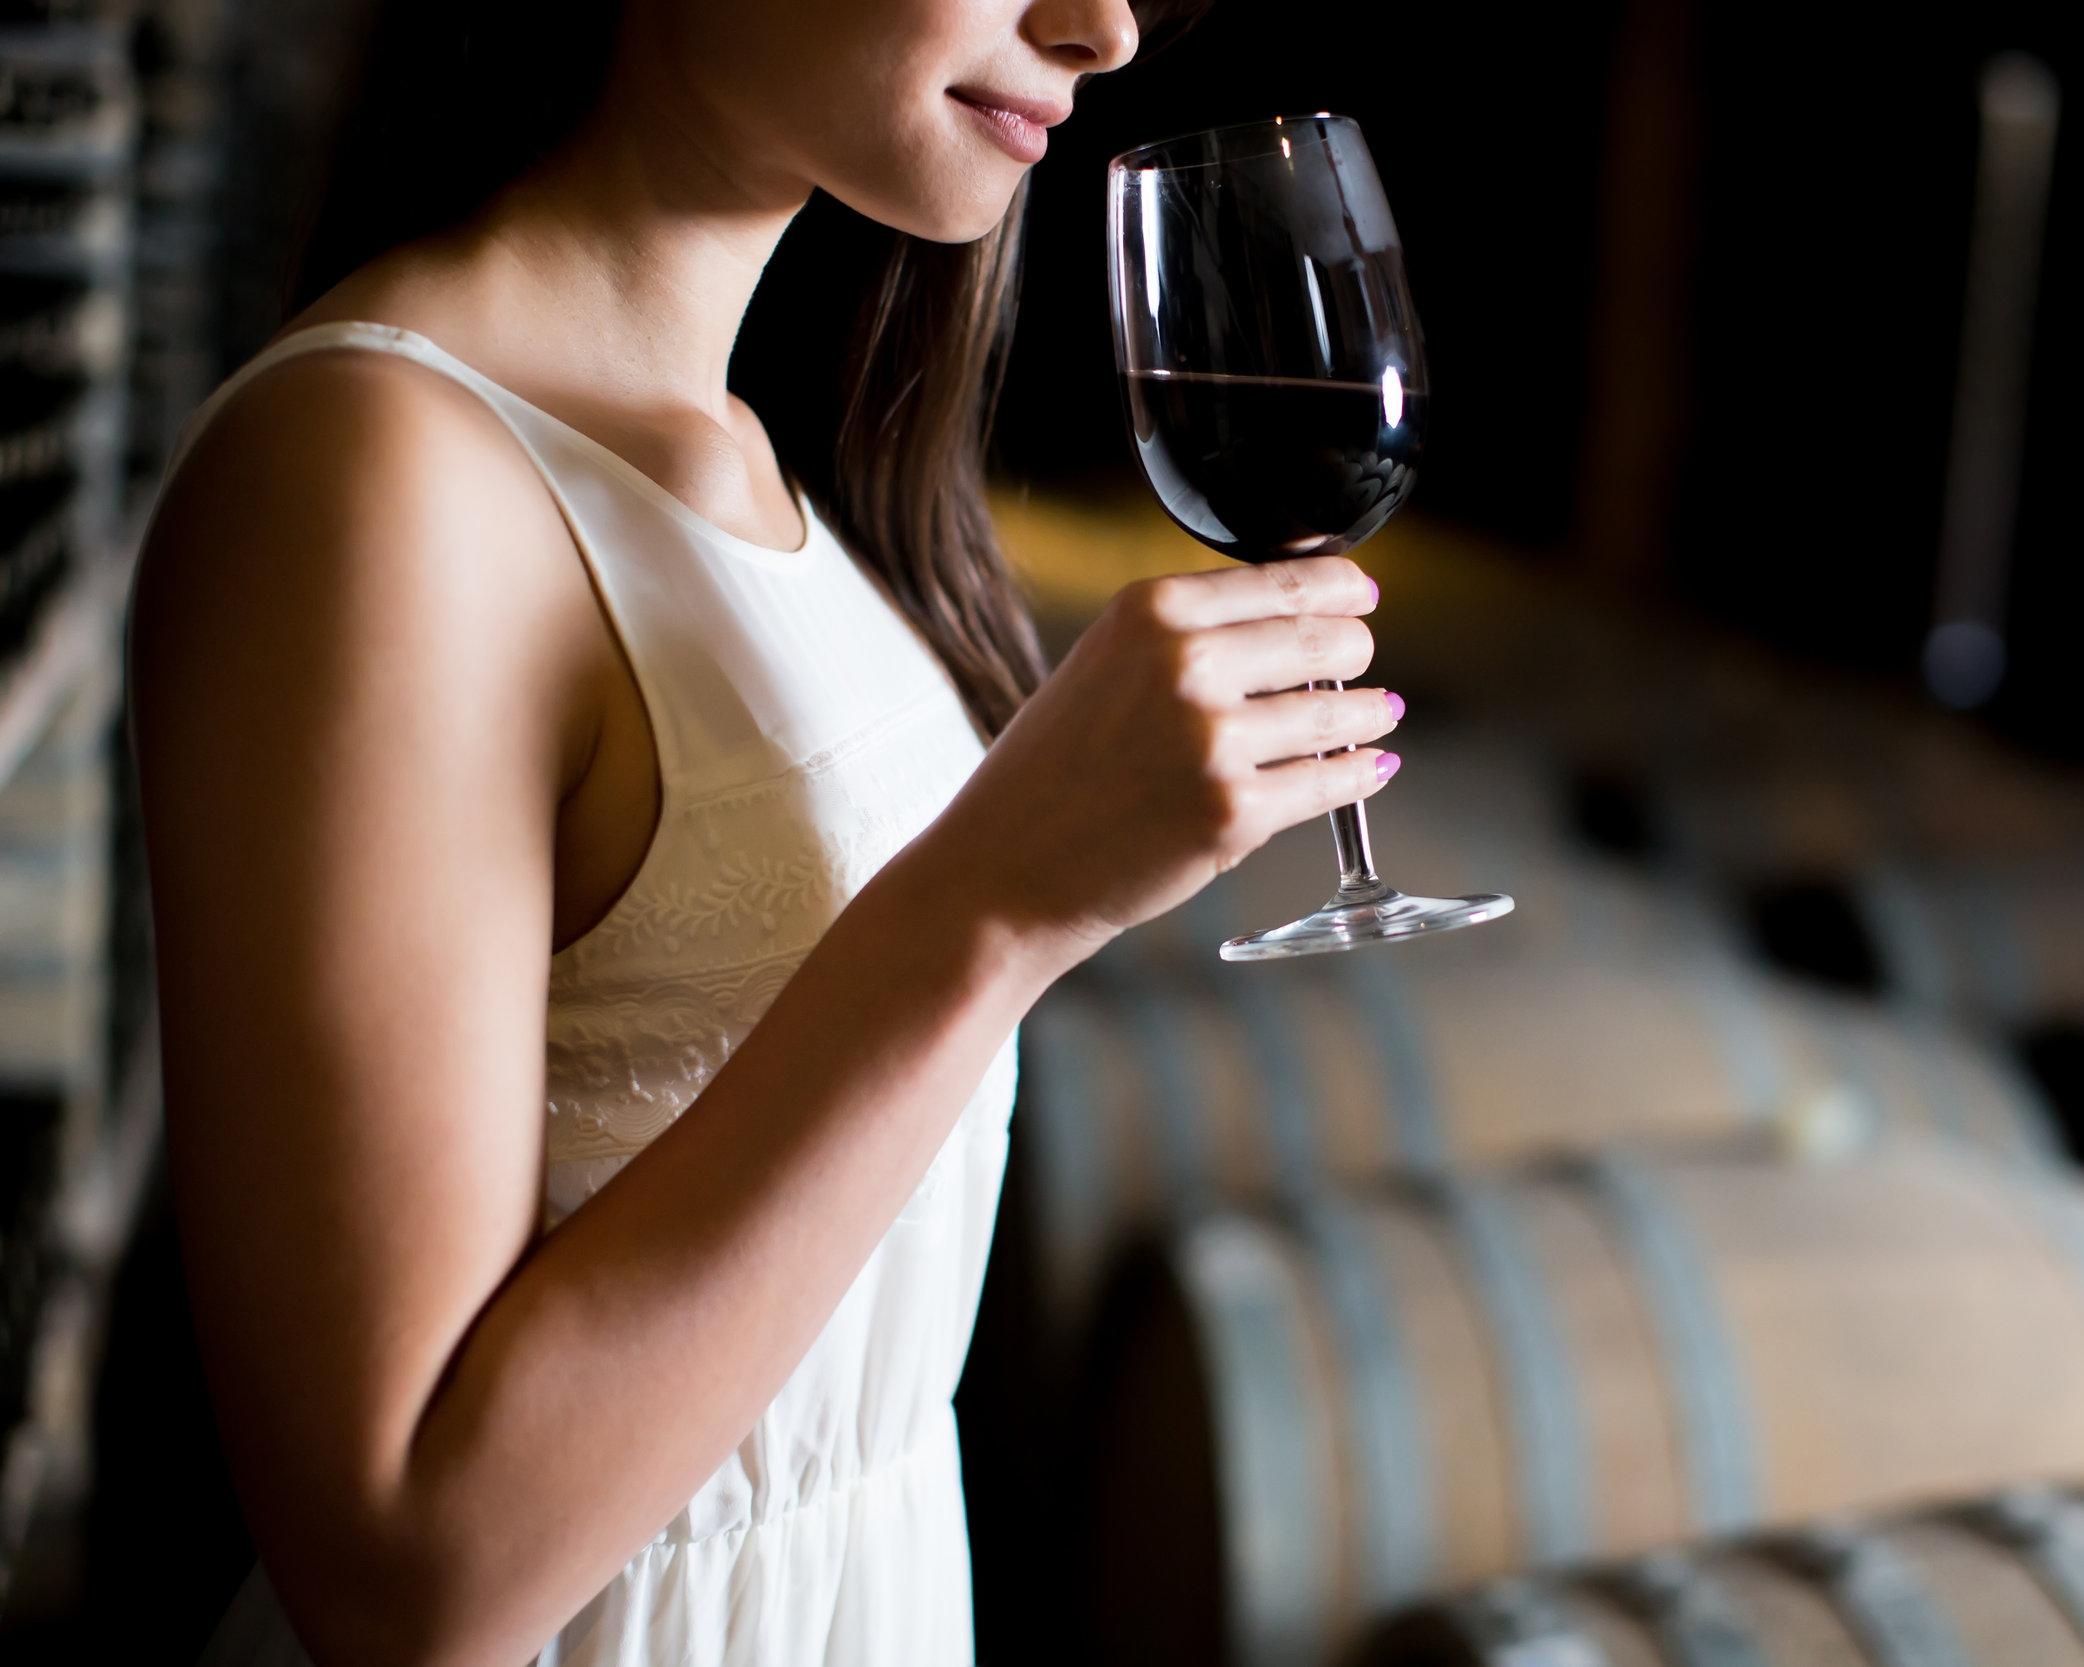 Daniel_Island_Wine_Bar_Wine_Tasting.jpeg